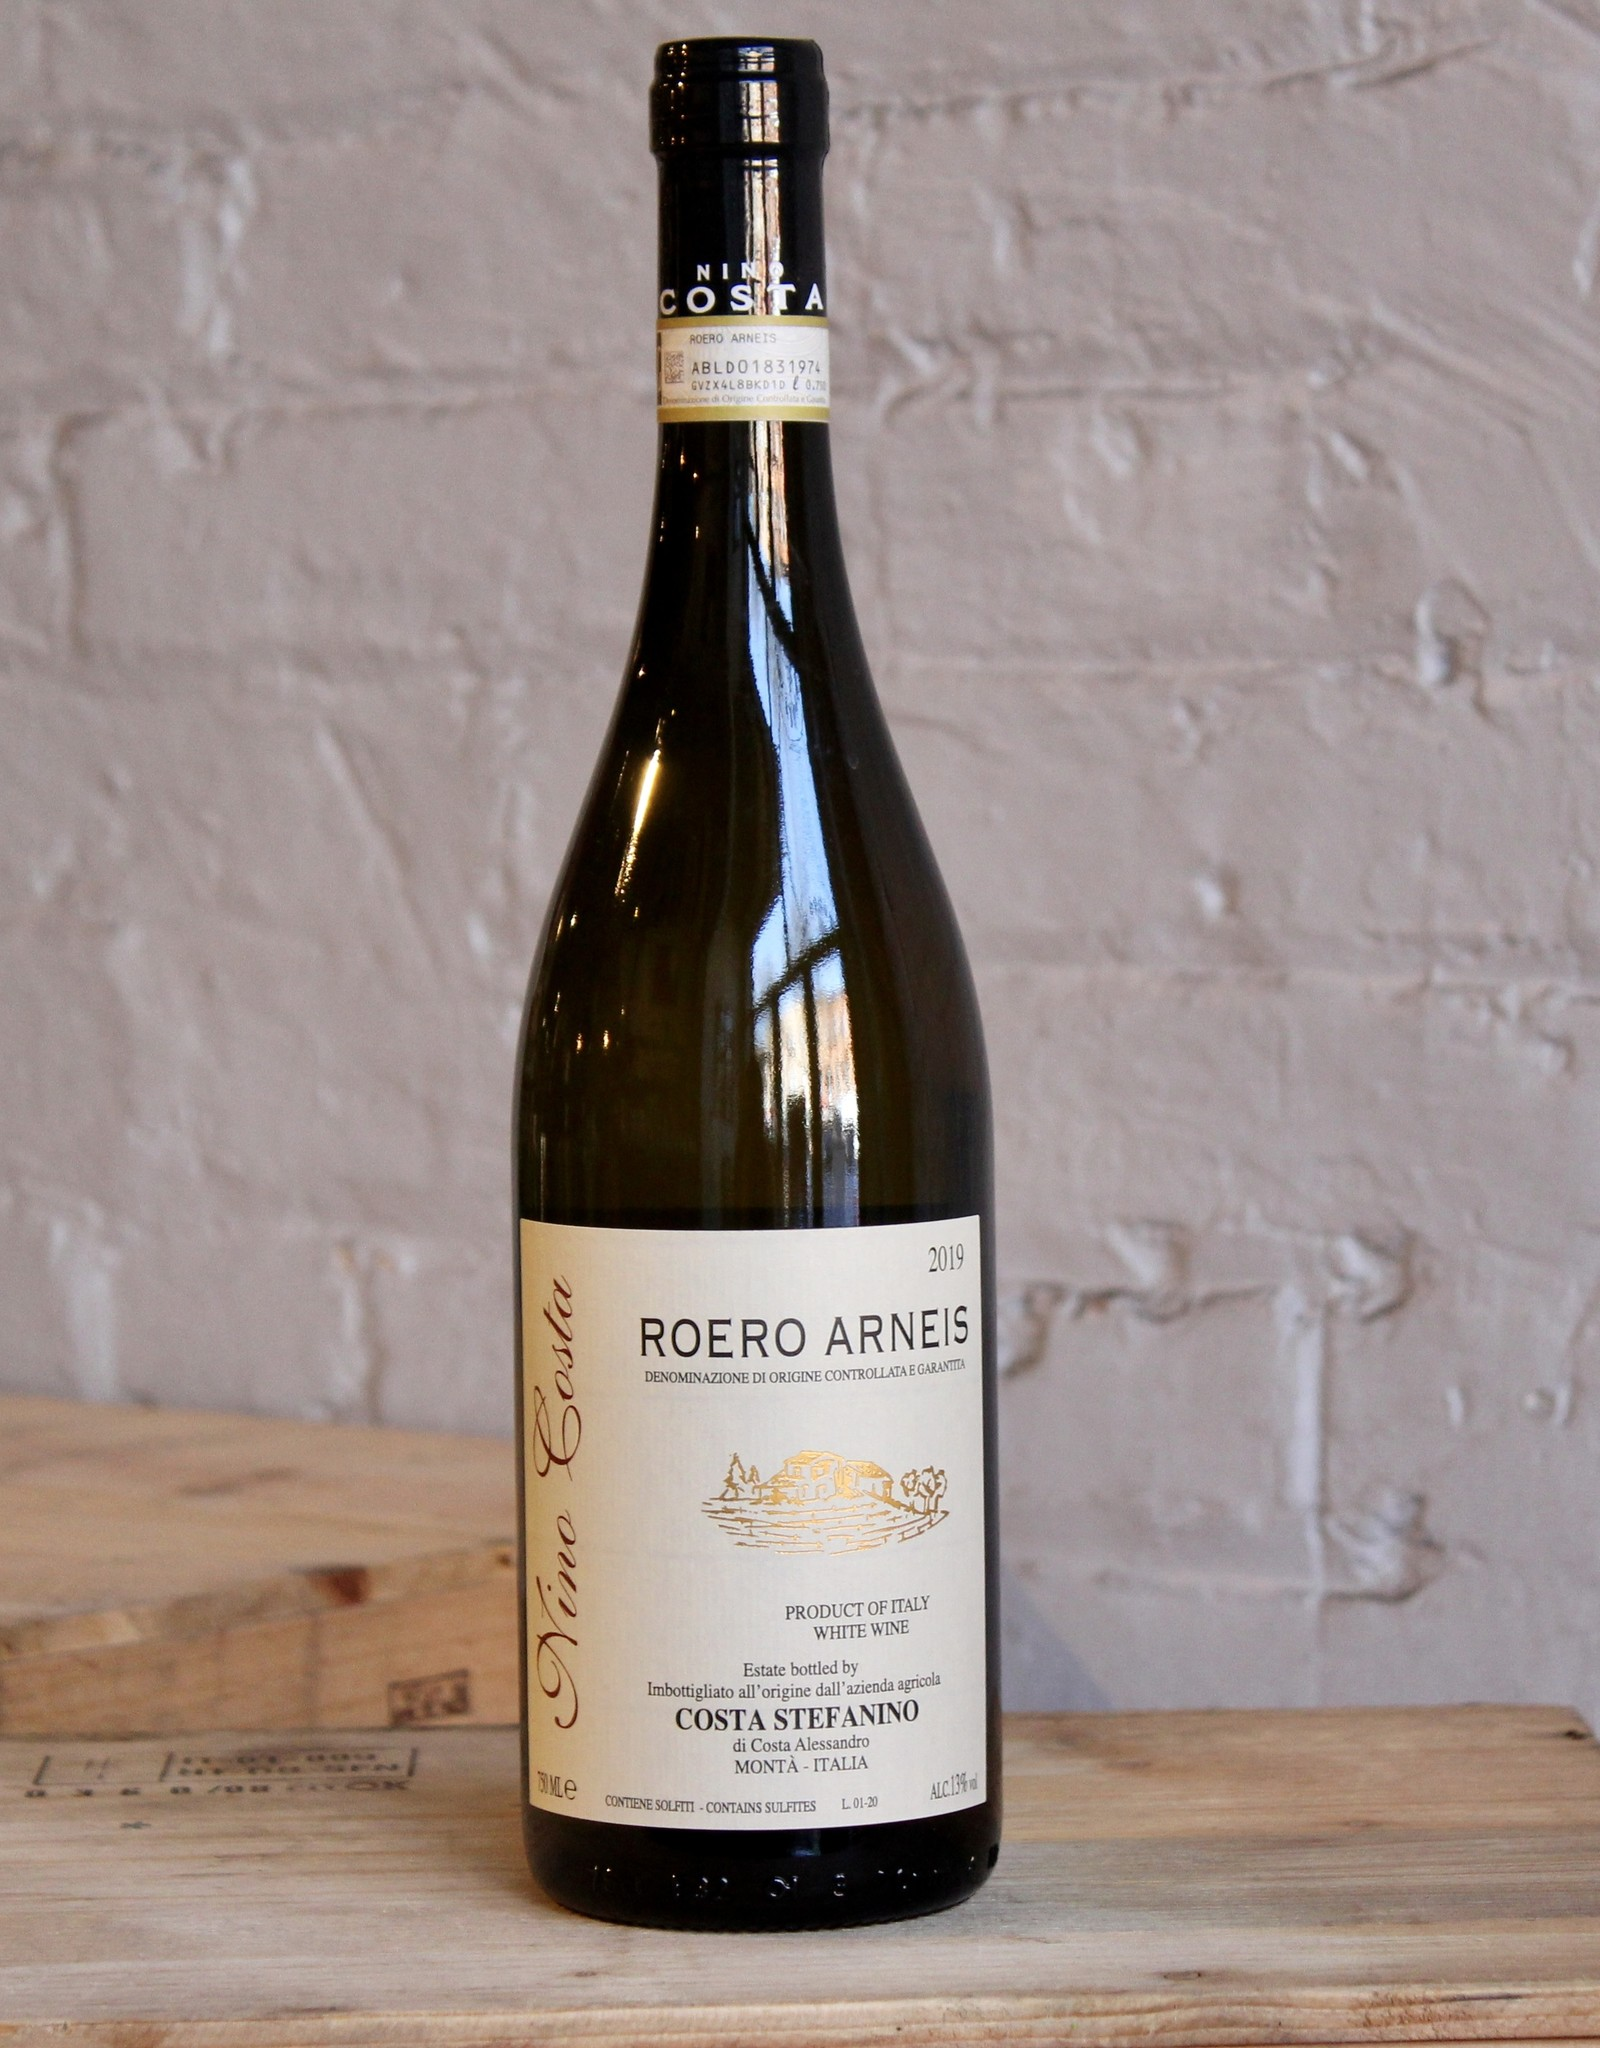 Wine 2019 Nino Costa Sarun Roero Arneis - Piedmont, Italy (750ml)